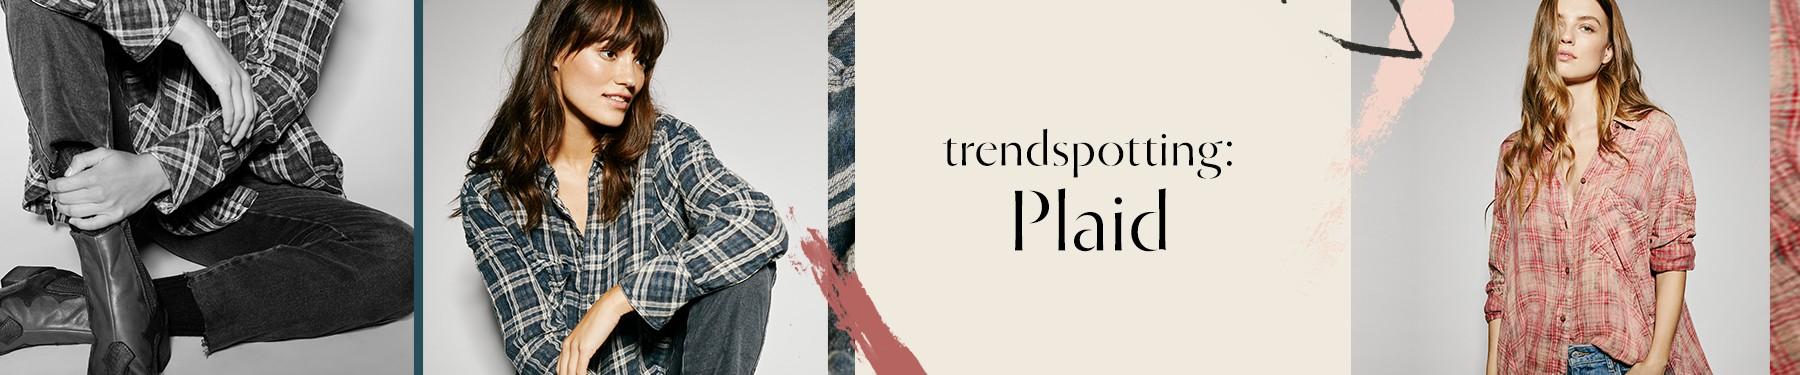 Trendspotting Plaid